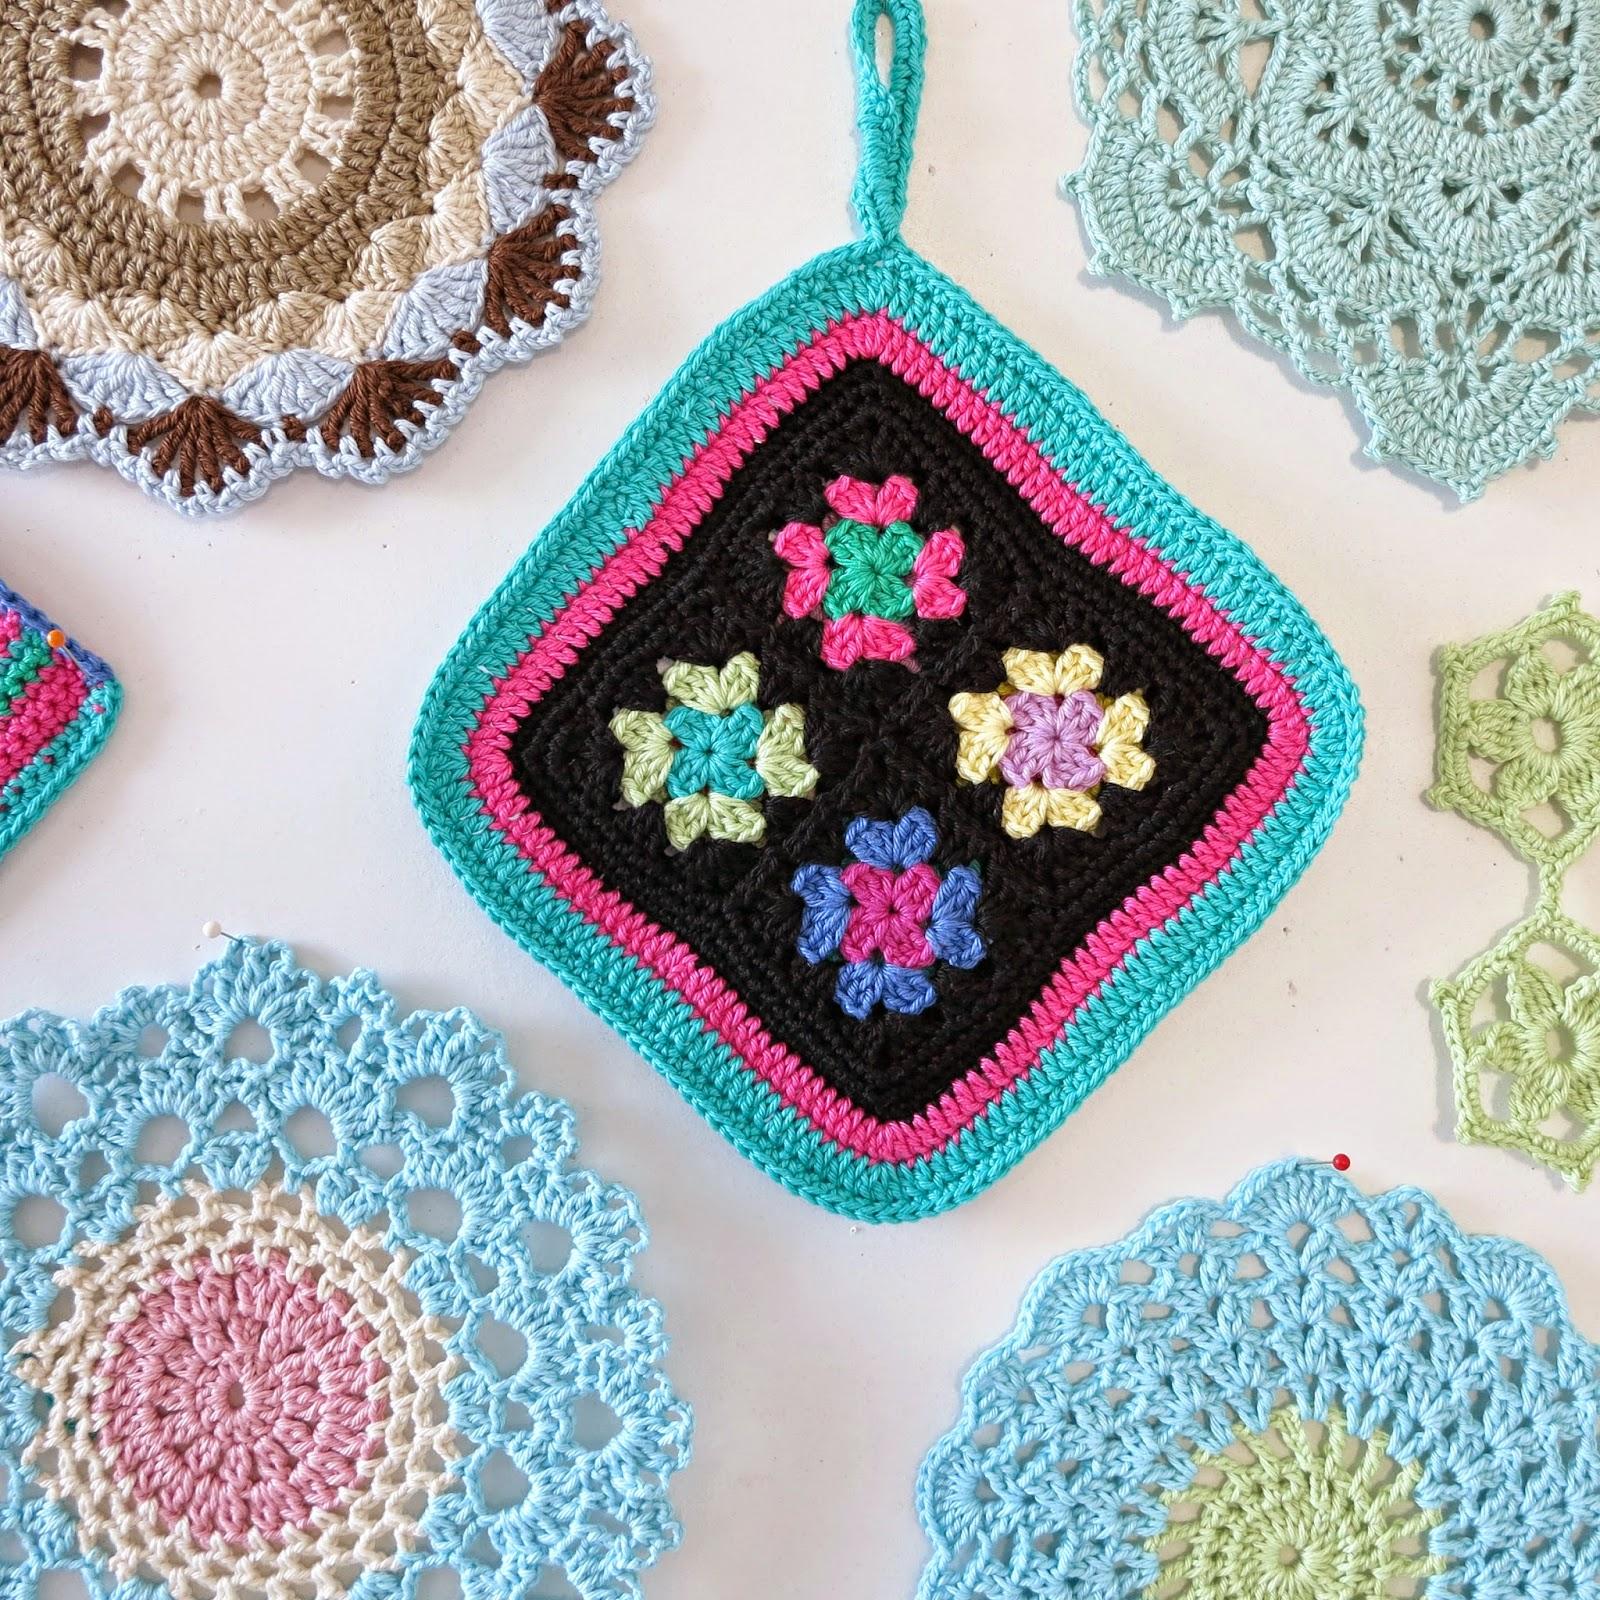 ByHaafner, crochet, potholder, doily, pastel, granny square